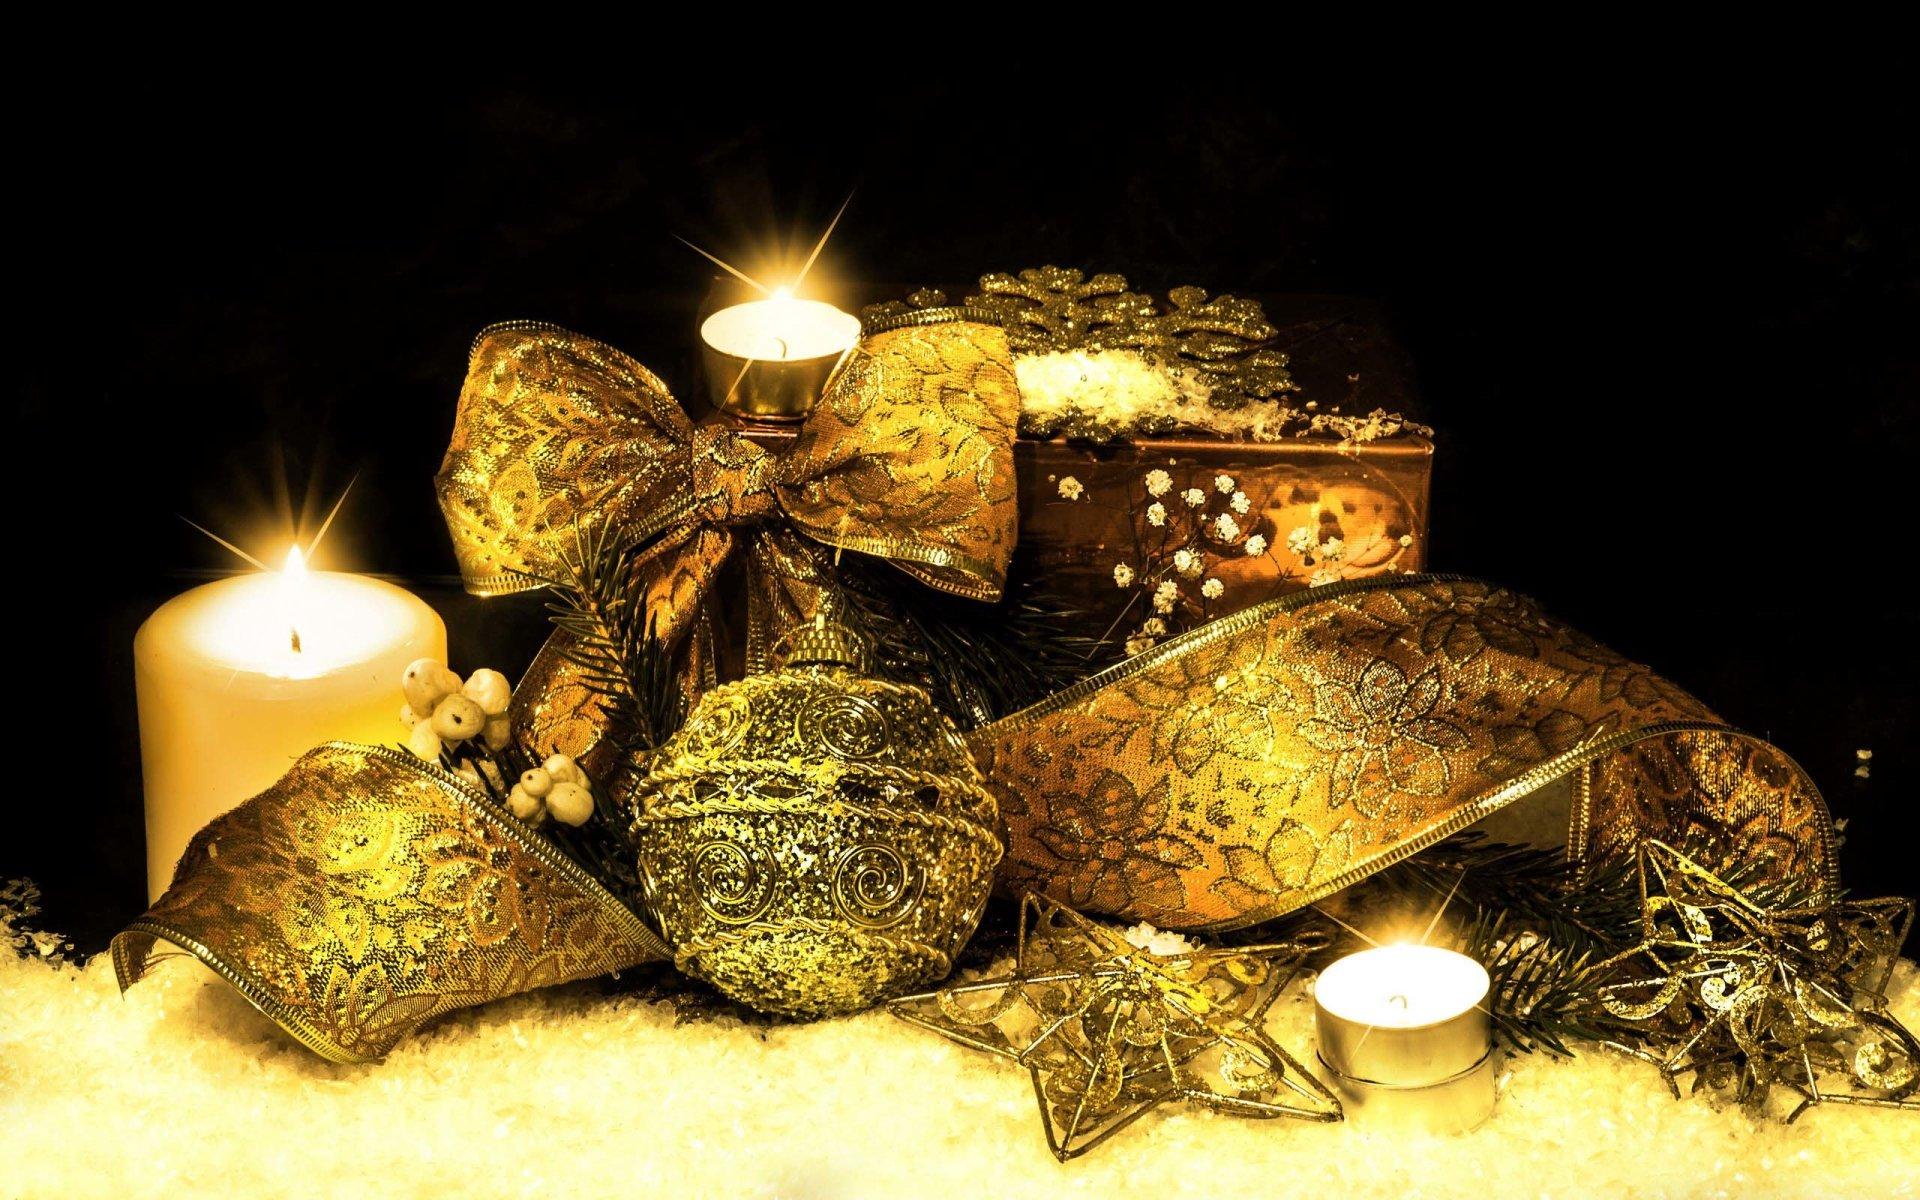 节日 - 圣诞节  Golden 节日 Christmas Ornaments Ribbon Star 蜡烛 壁纸